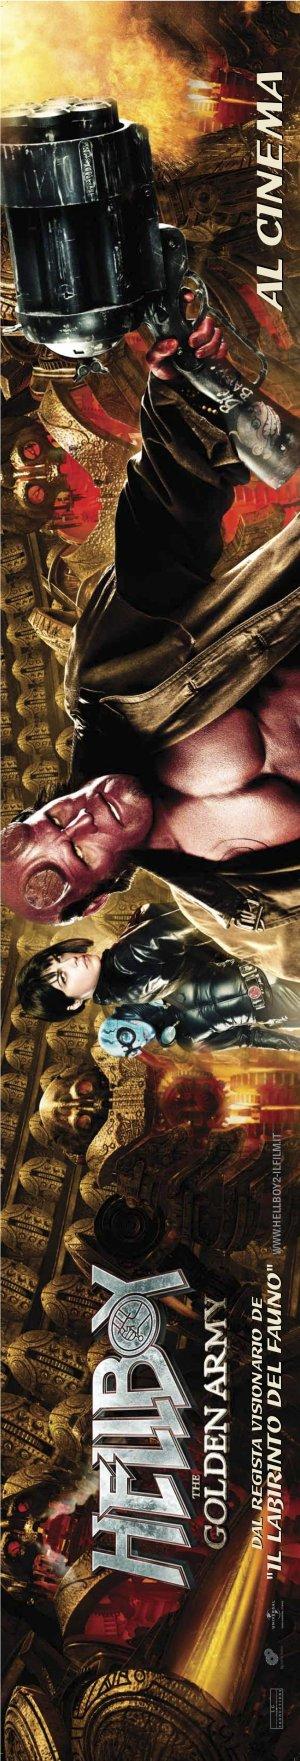 Hellboy II: The Golden Army 818x4801